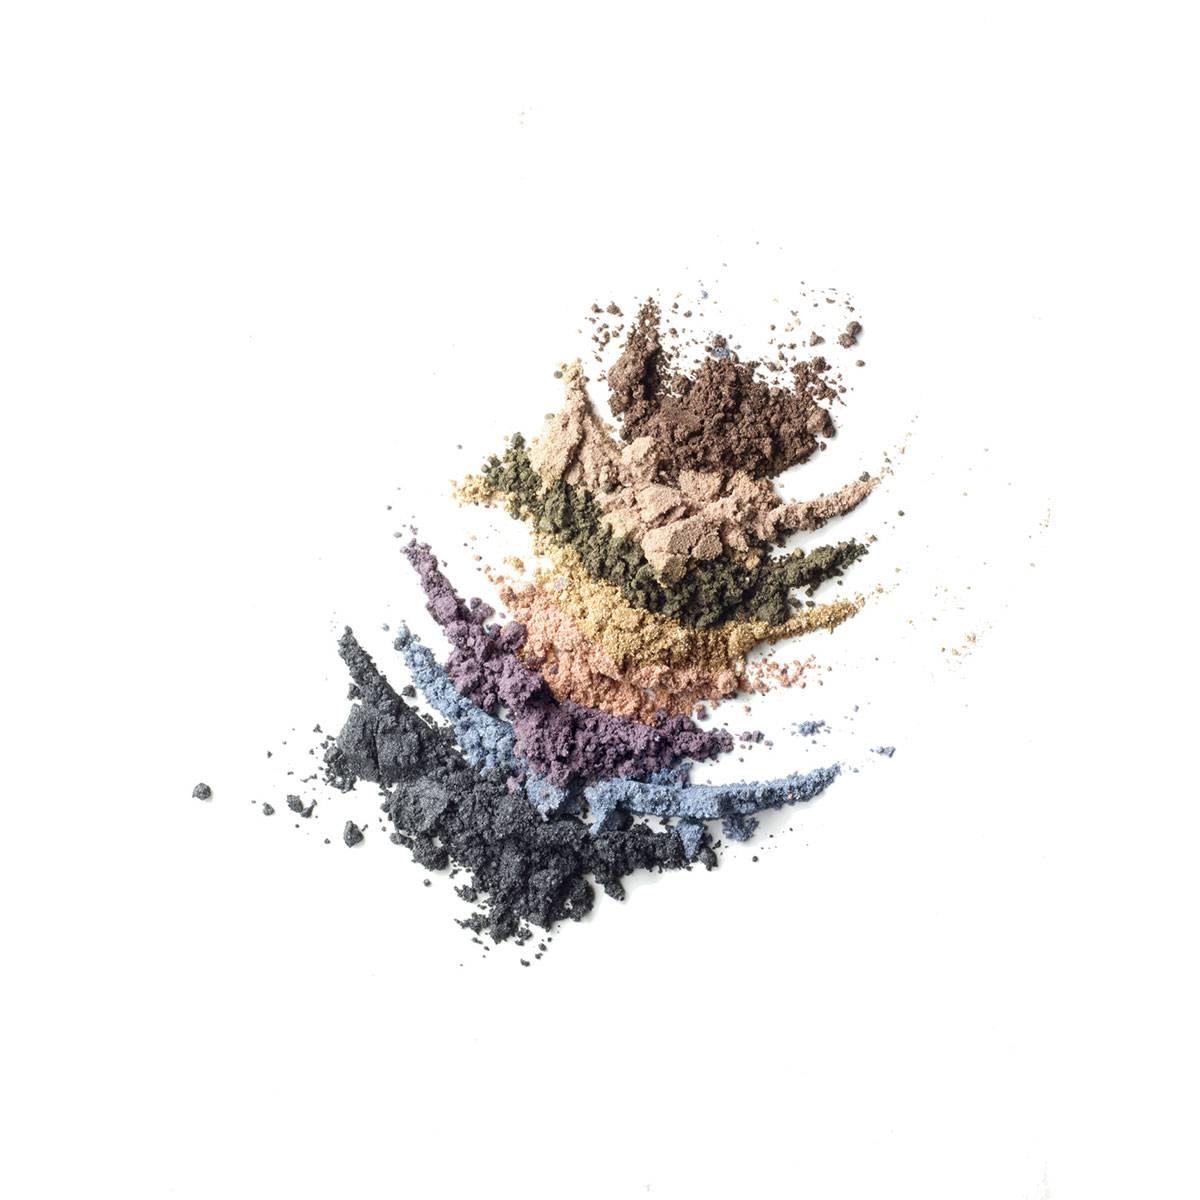 La Roche Posay Sensitive Toleriane Make up EYE_SHADOW Texture